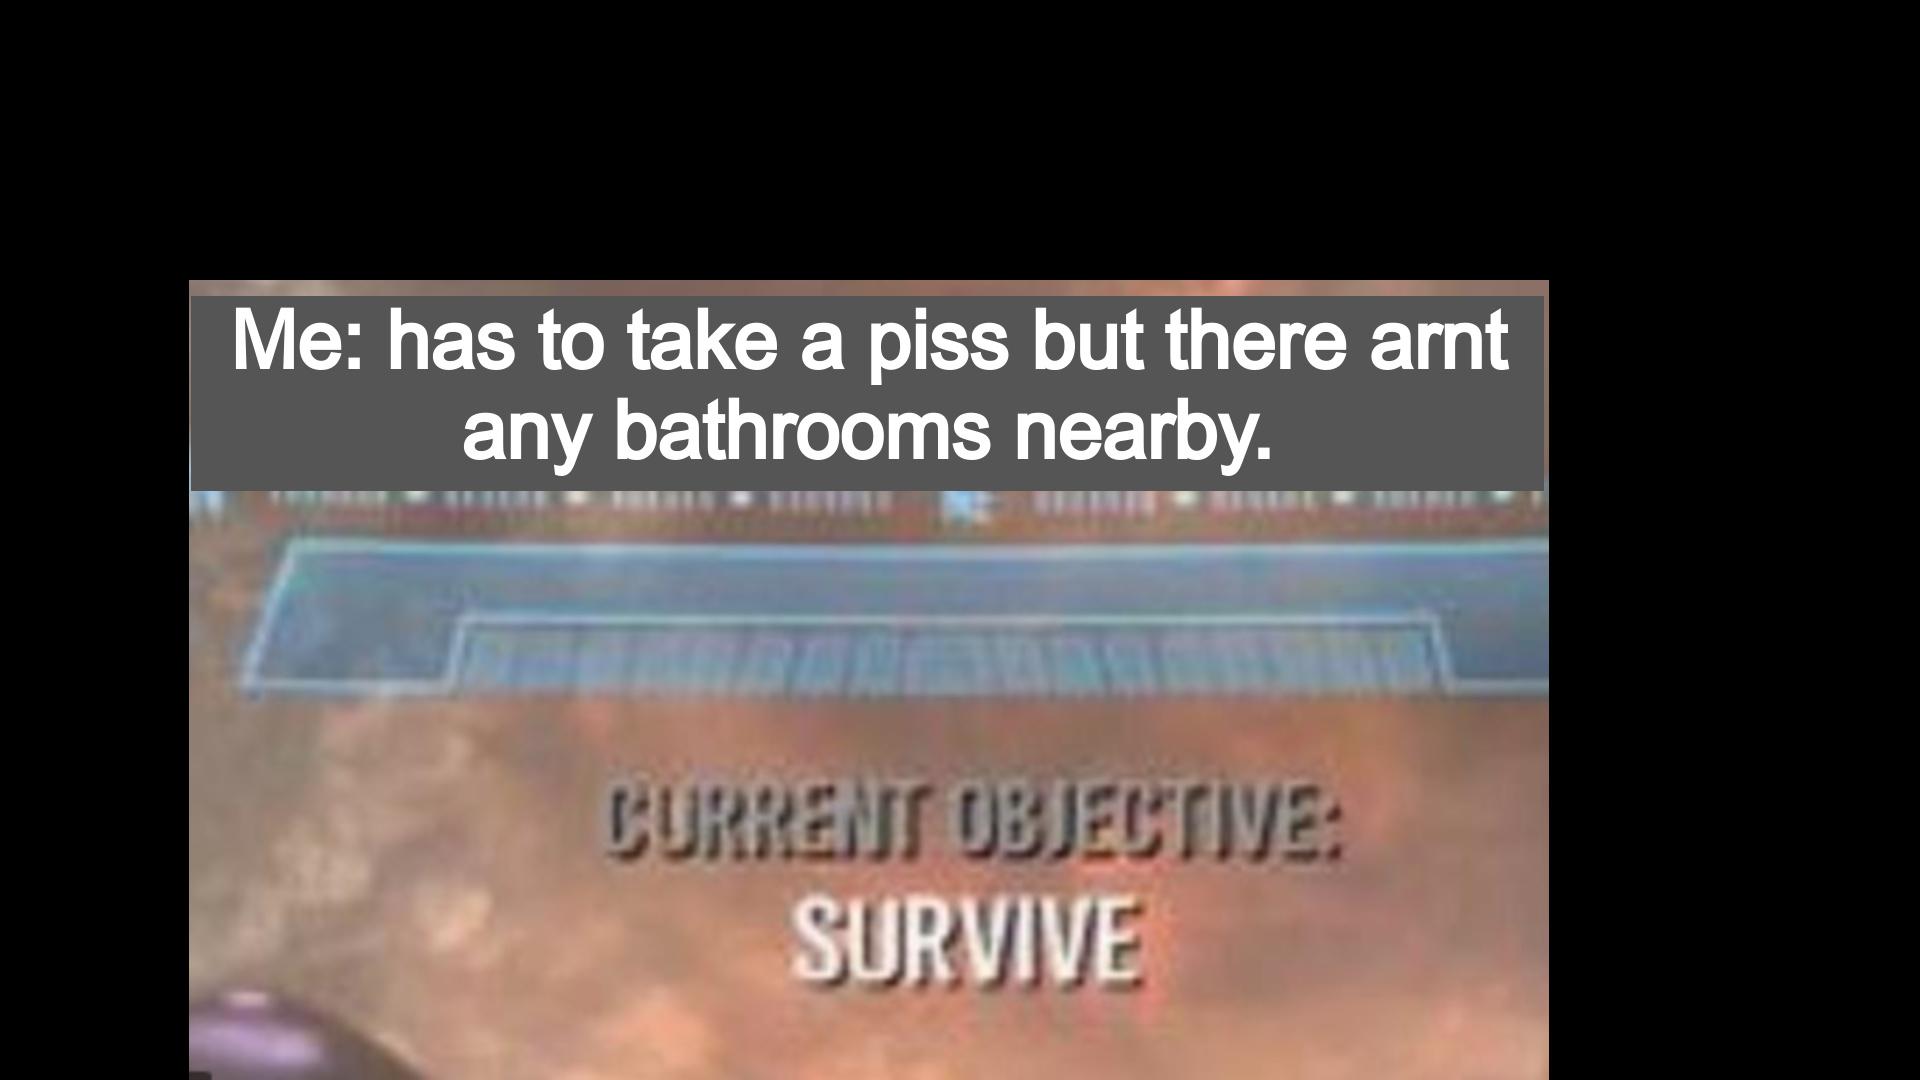 Don't piss urself - meme